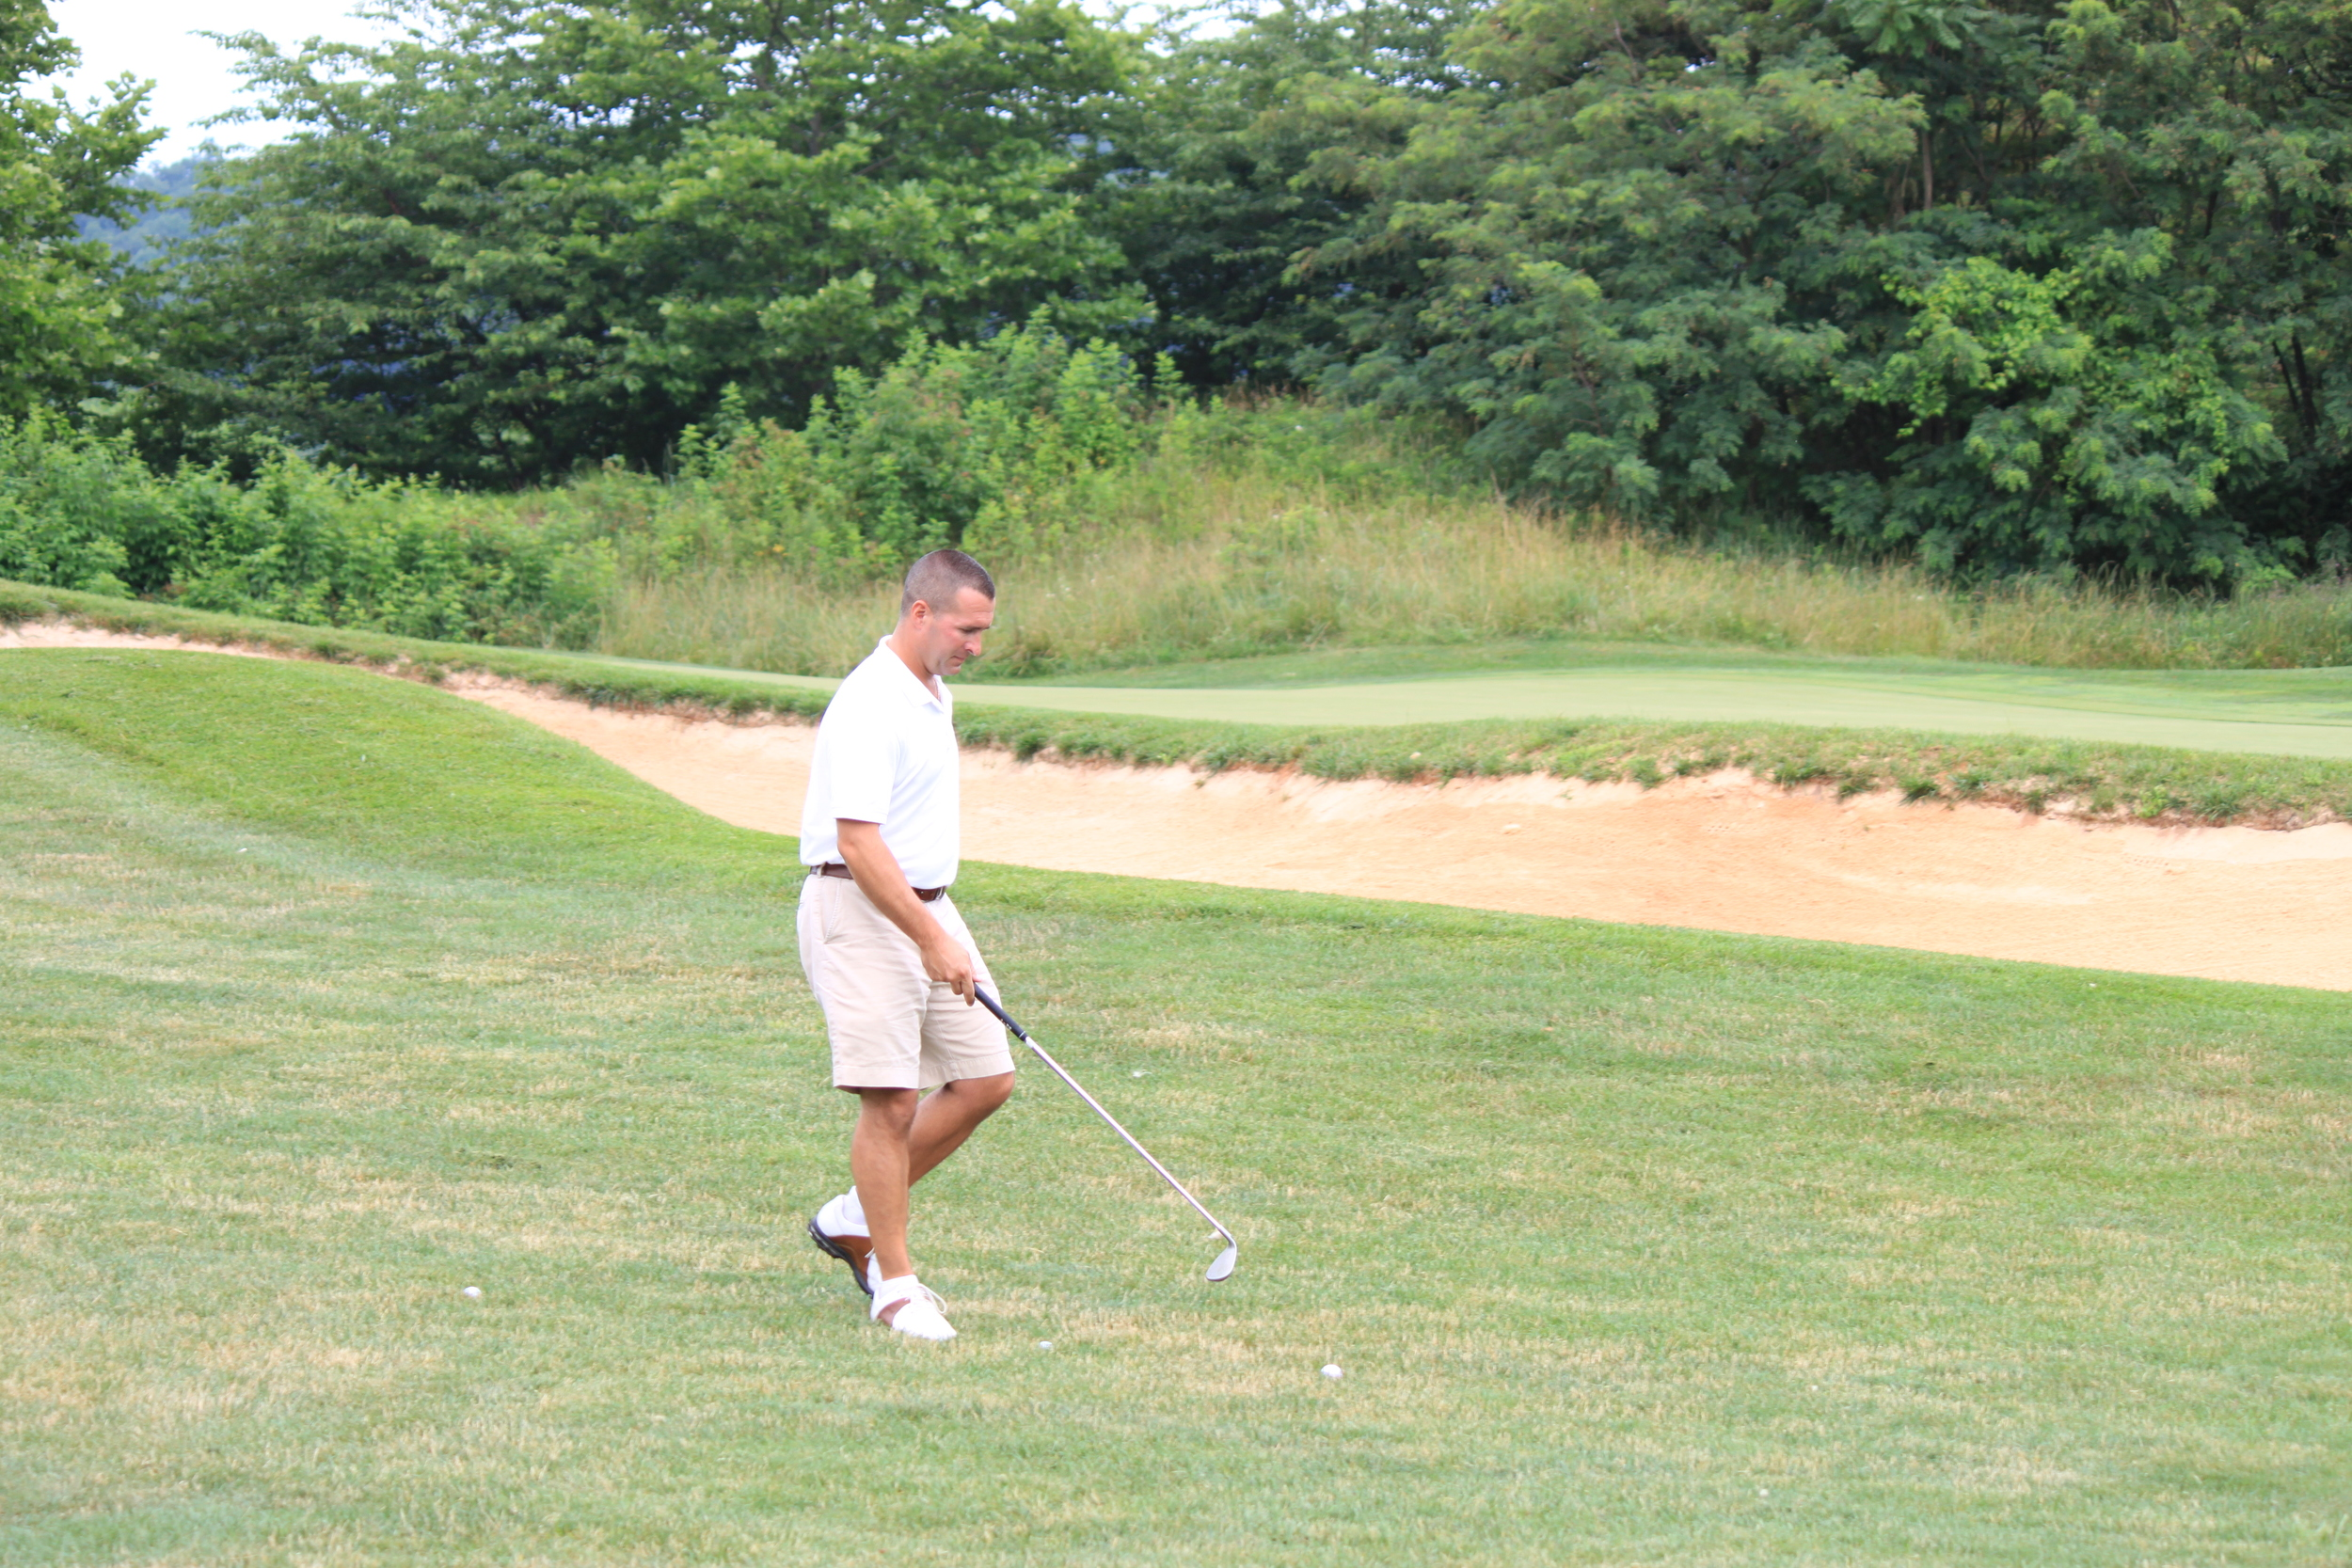 Dennis_Fitzgerald_Golf_Tournament_2011_IMG_3401.JPG